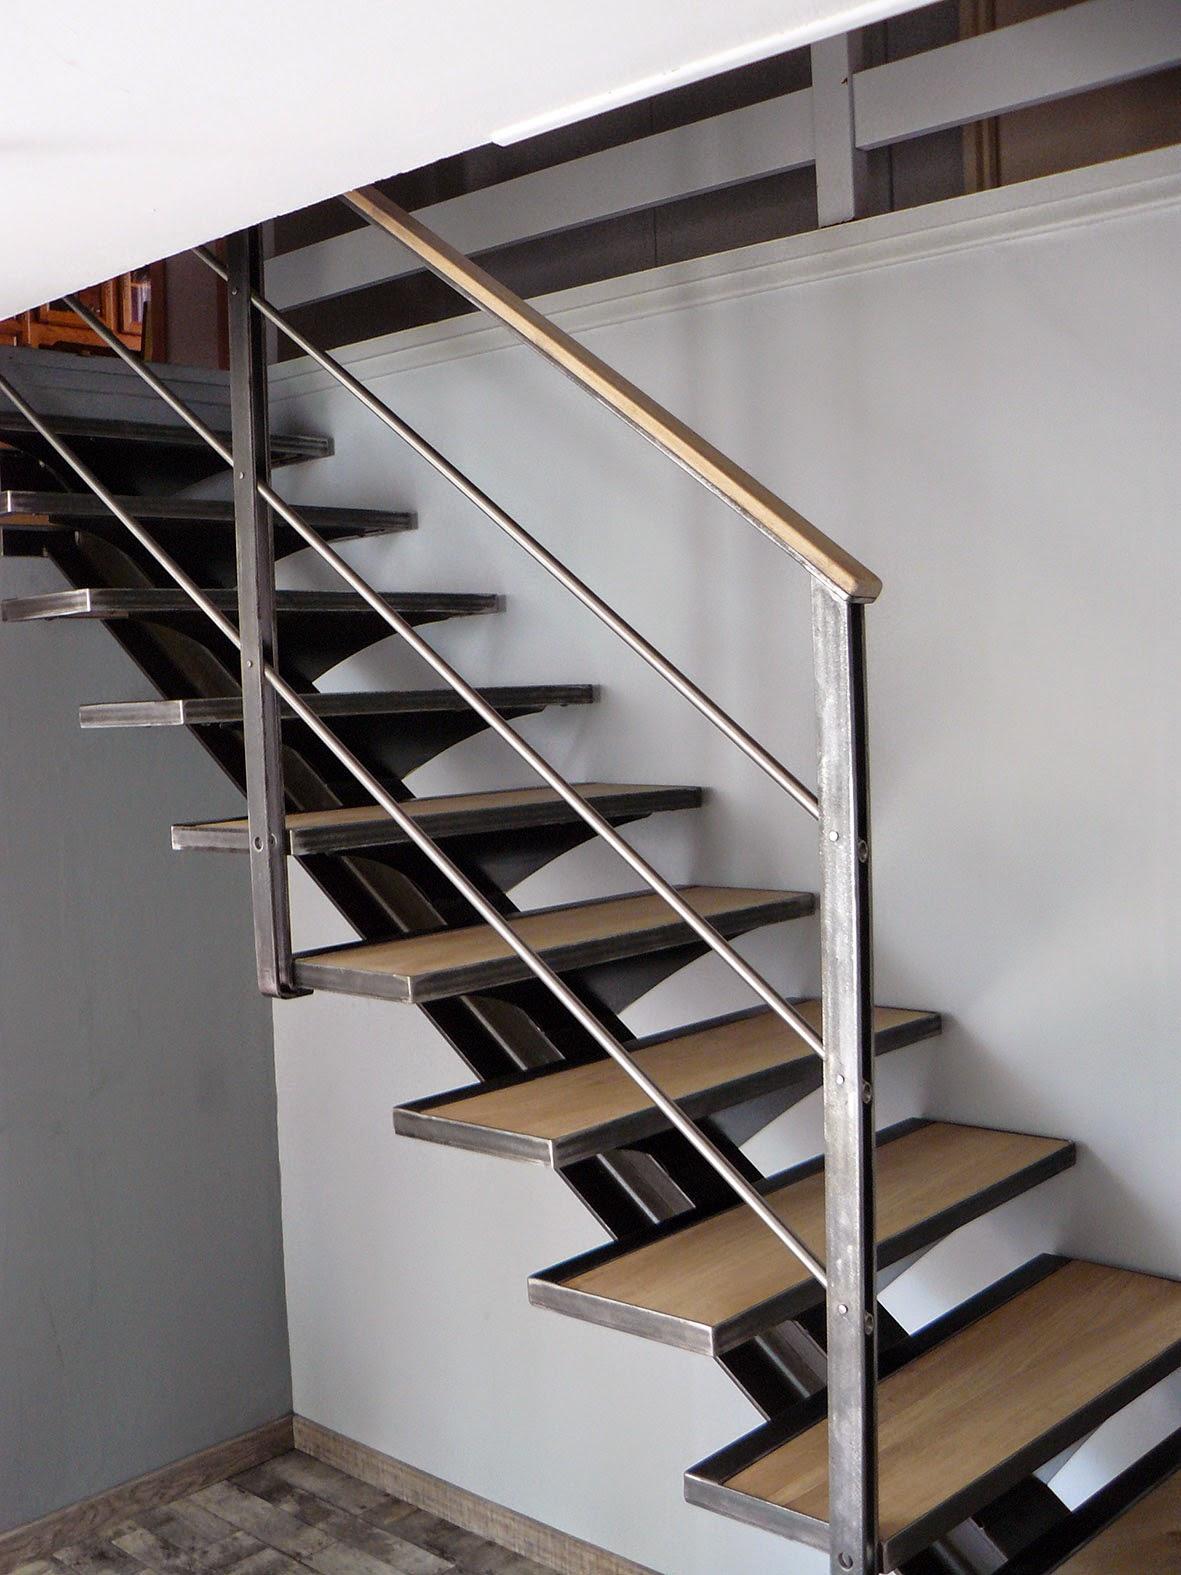 Ferronnerie métallerie serrurerie 79 Deux S u00e8vres L'Art du Fer Play Escalier 1 4 tournant #4 # Escalier Bois Et Fer